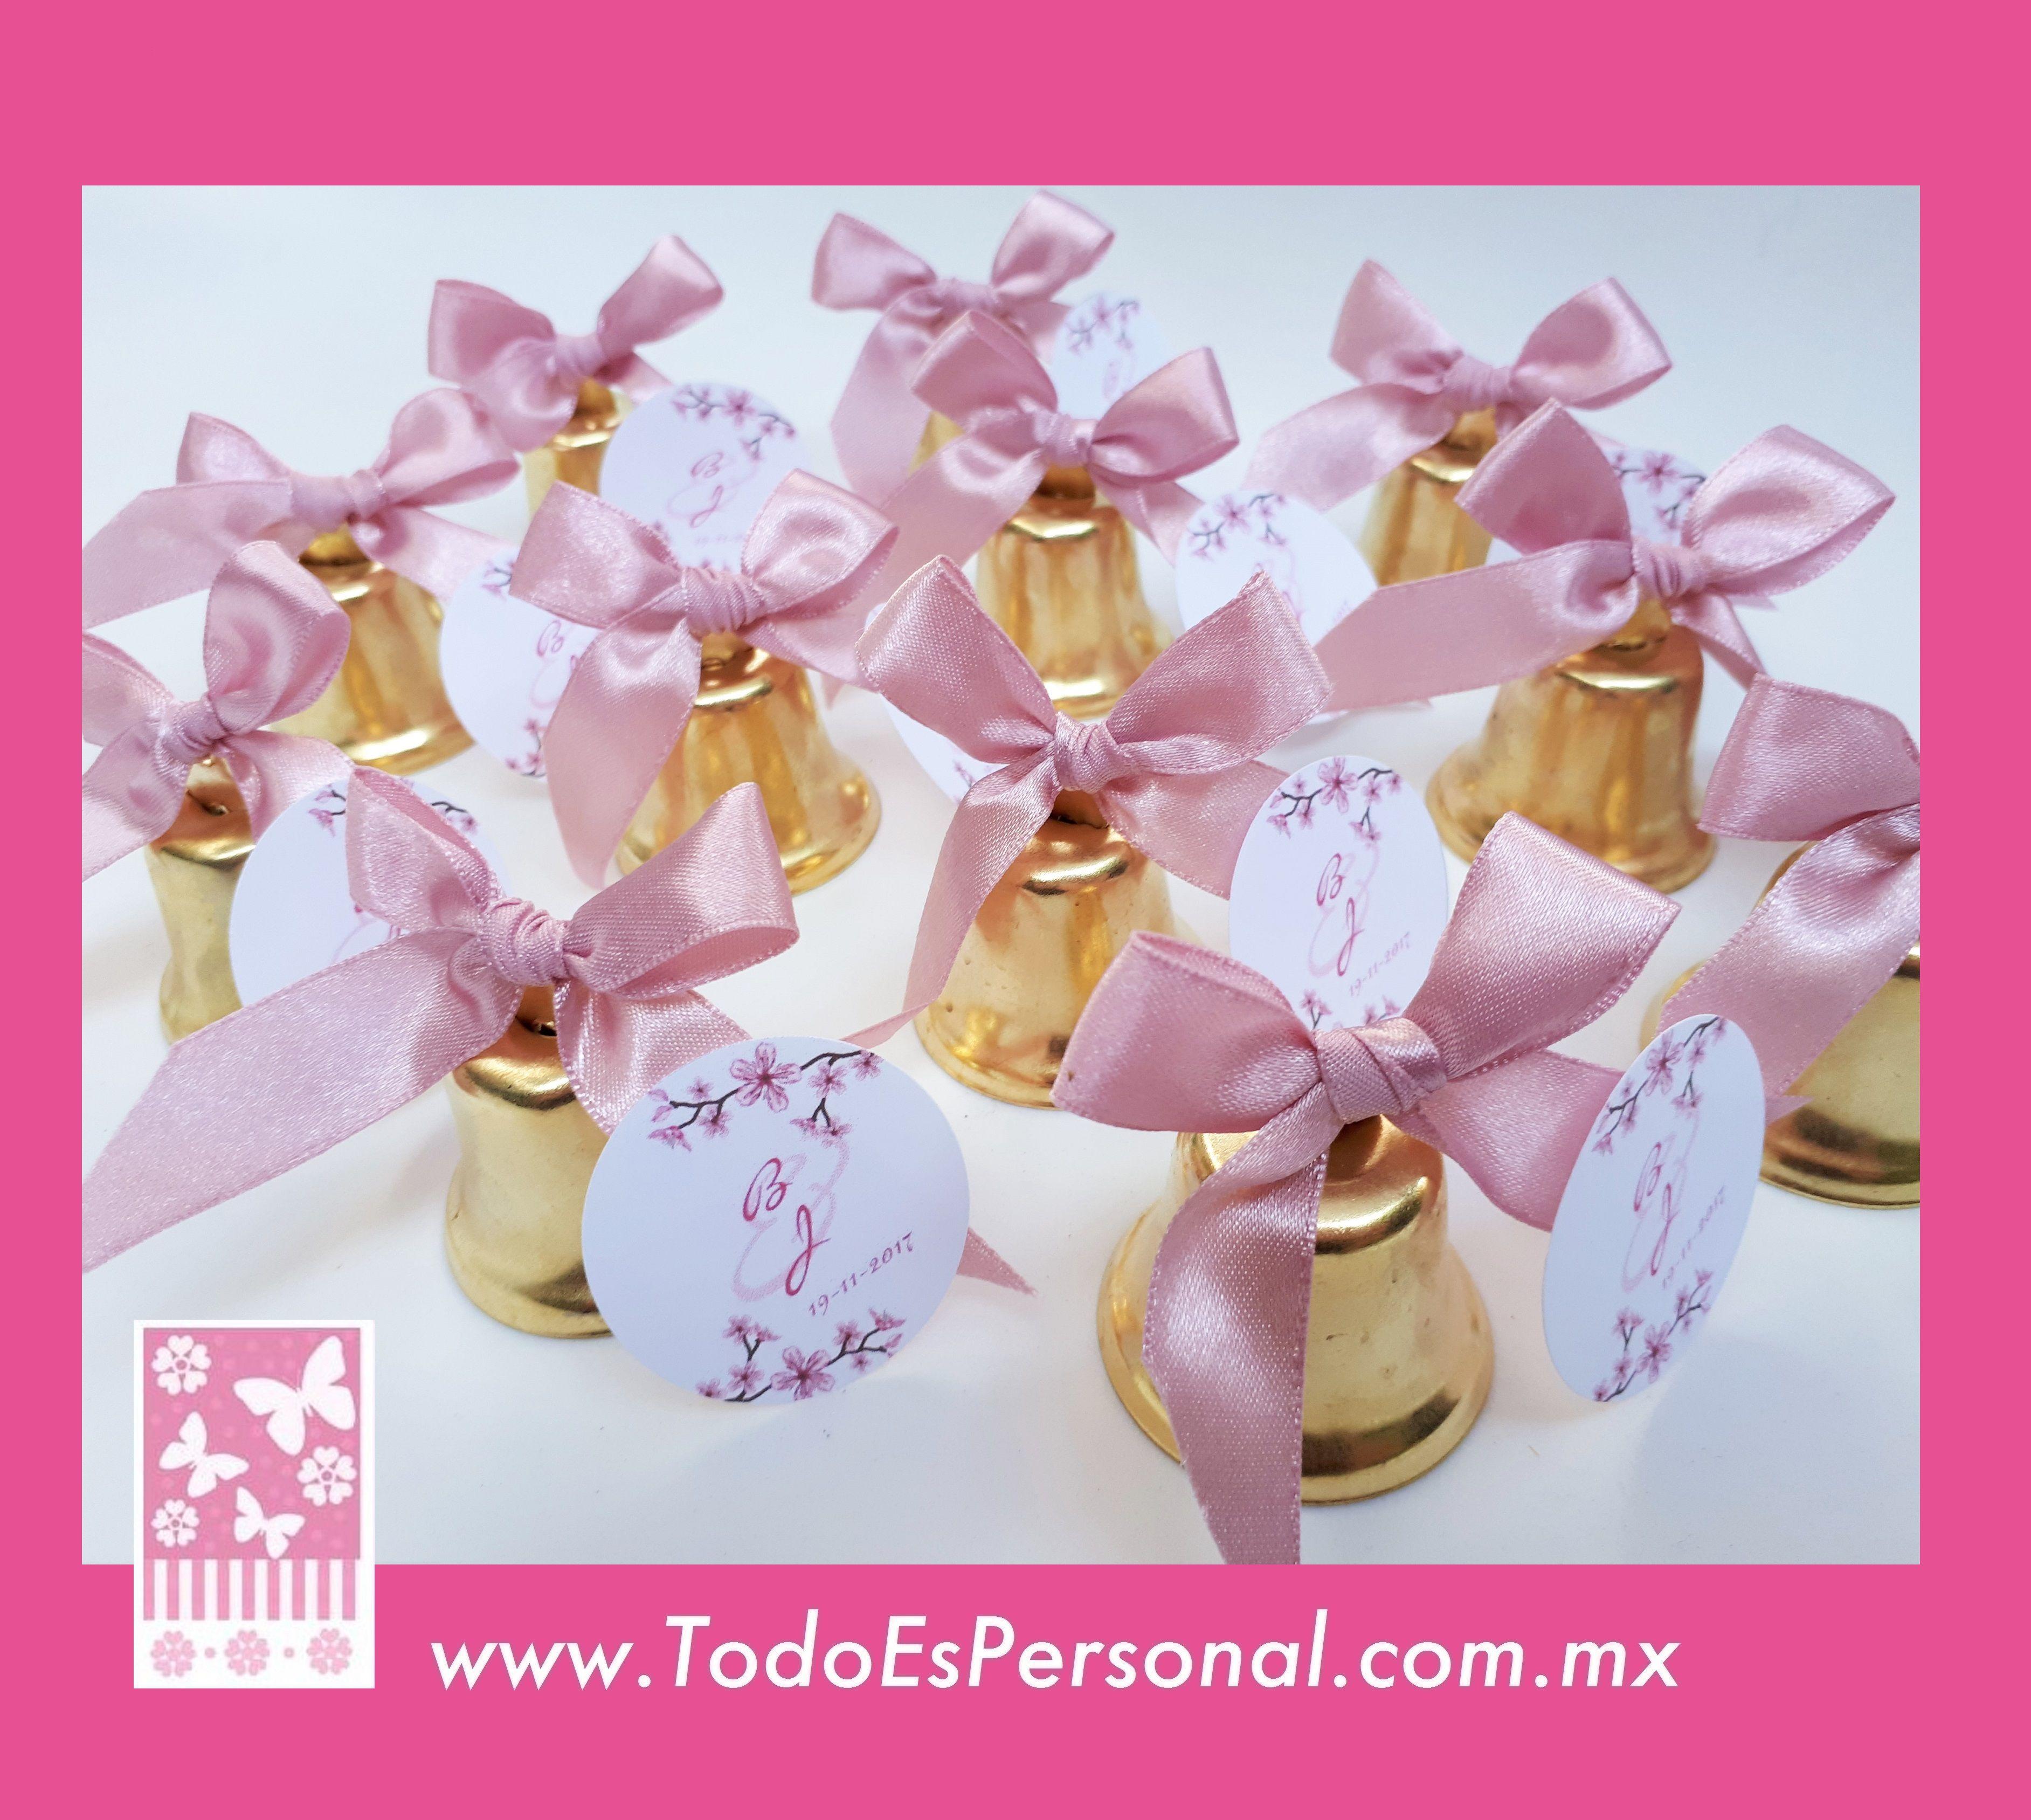 bolo para boda campanas doradas liston palo de rosa flores ...